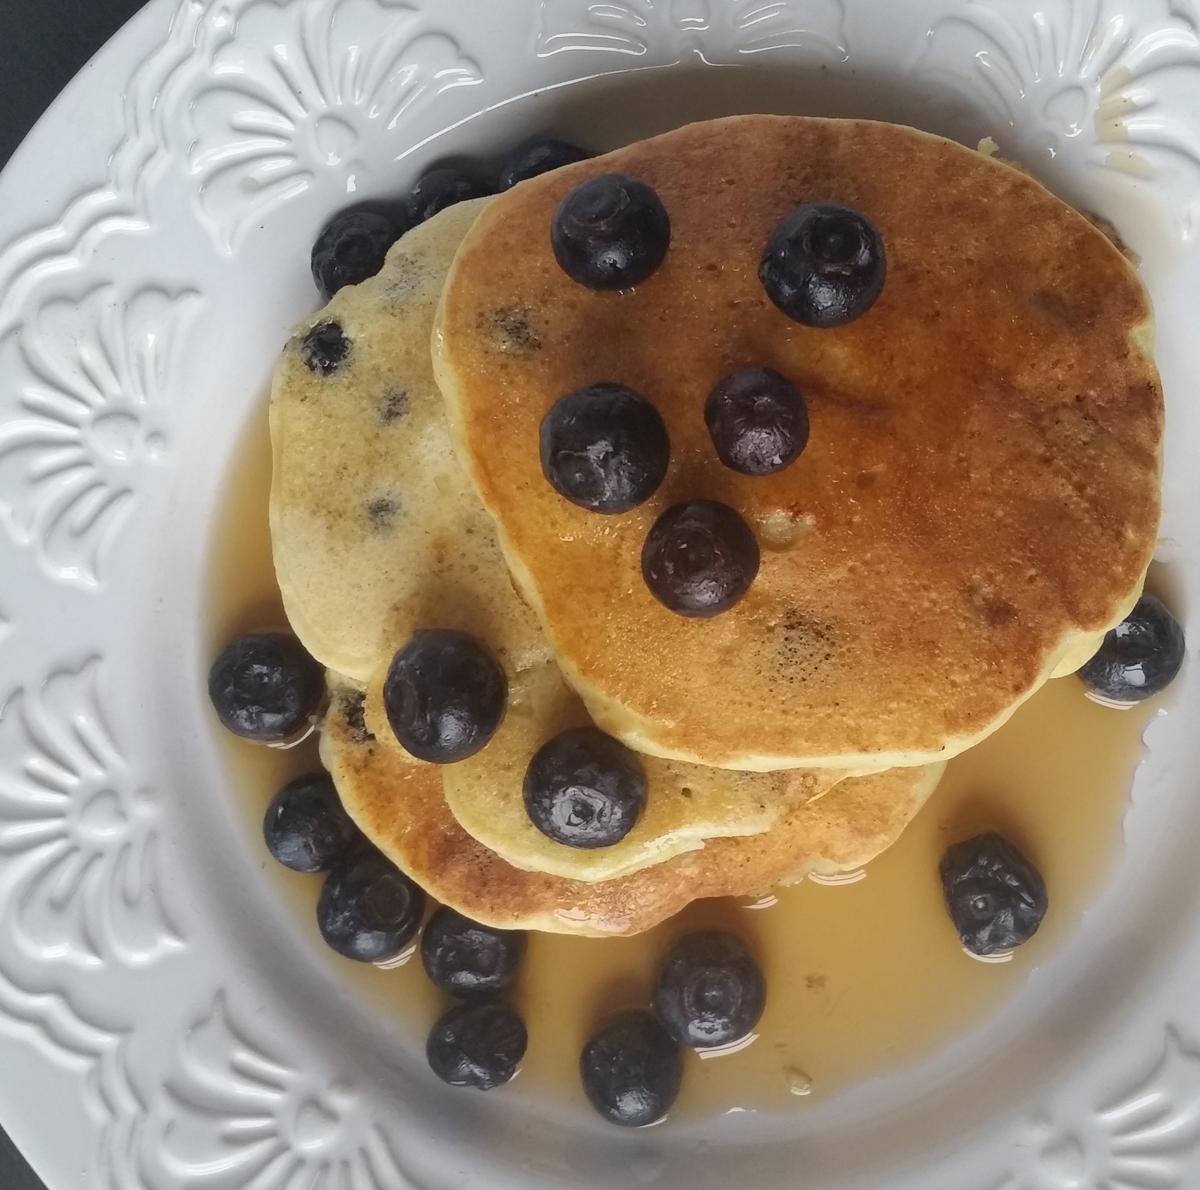 Bob's Red Mill Pancake Mix!